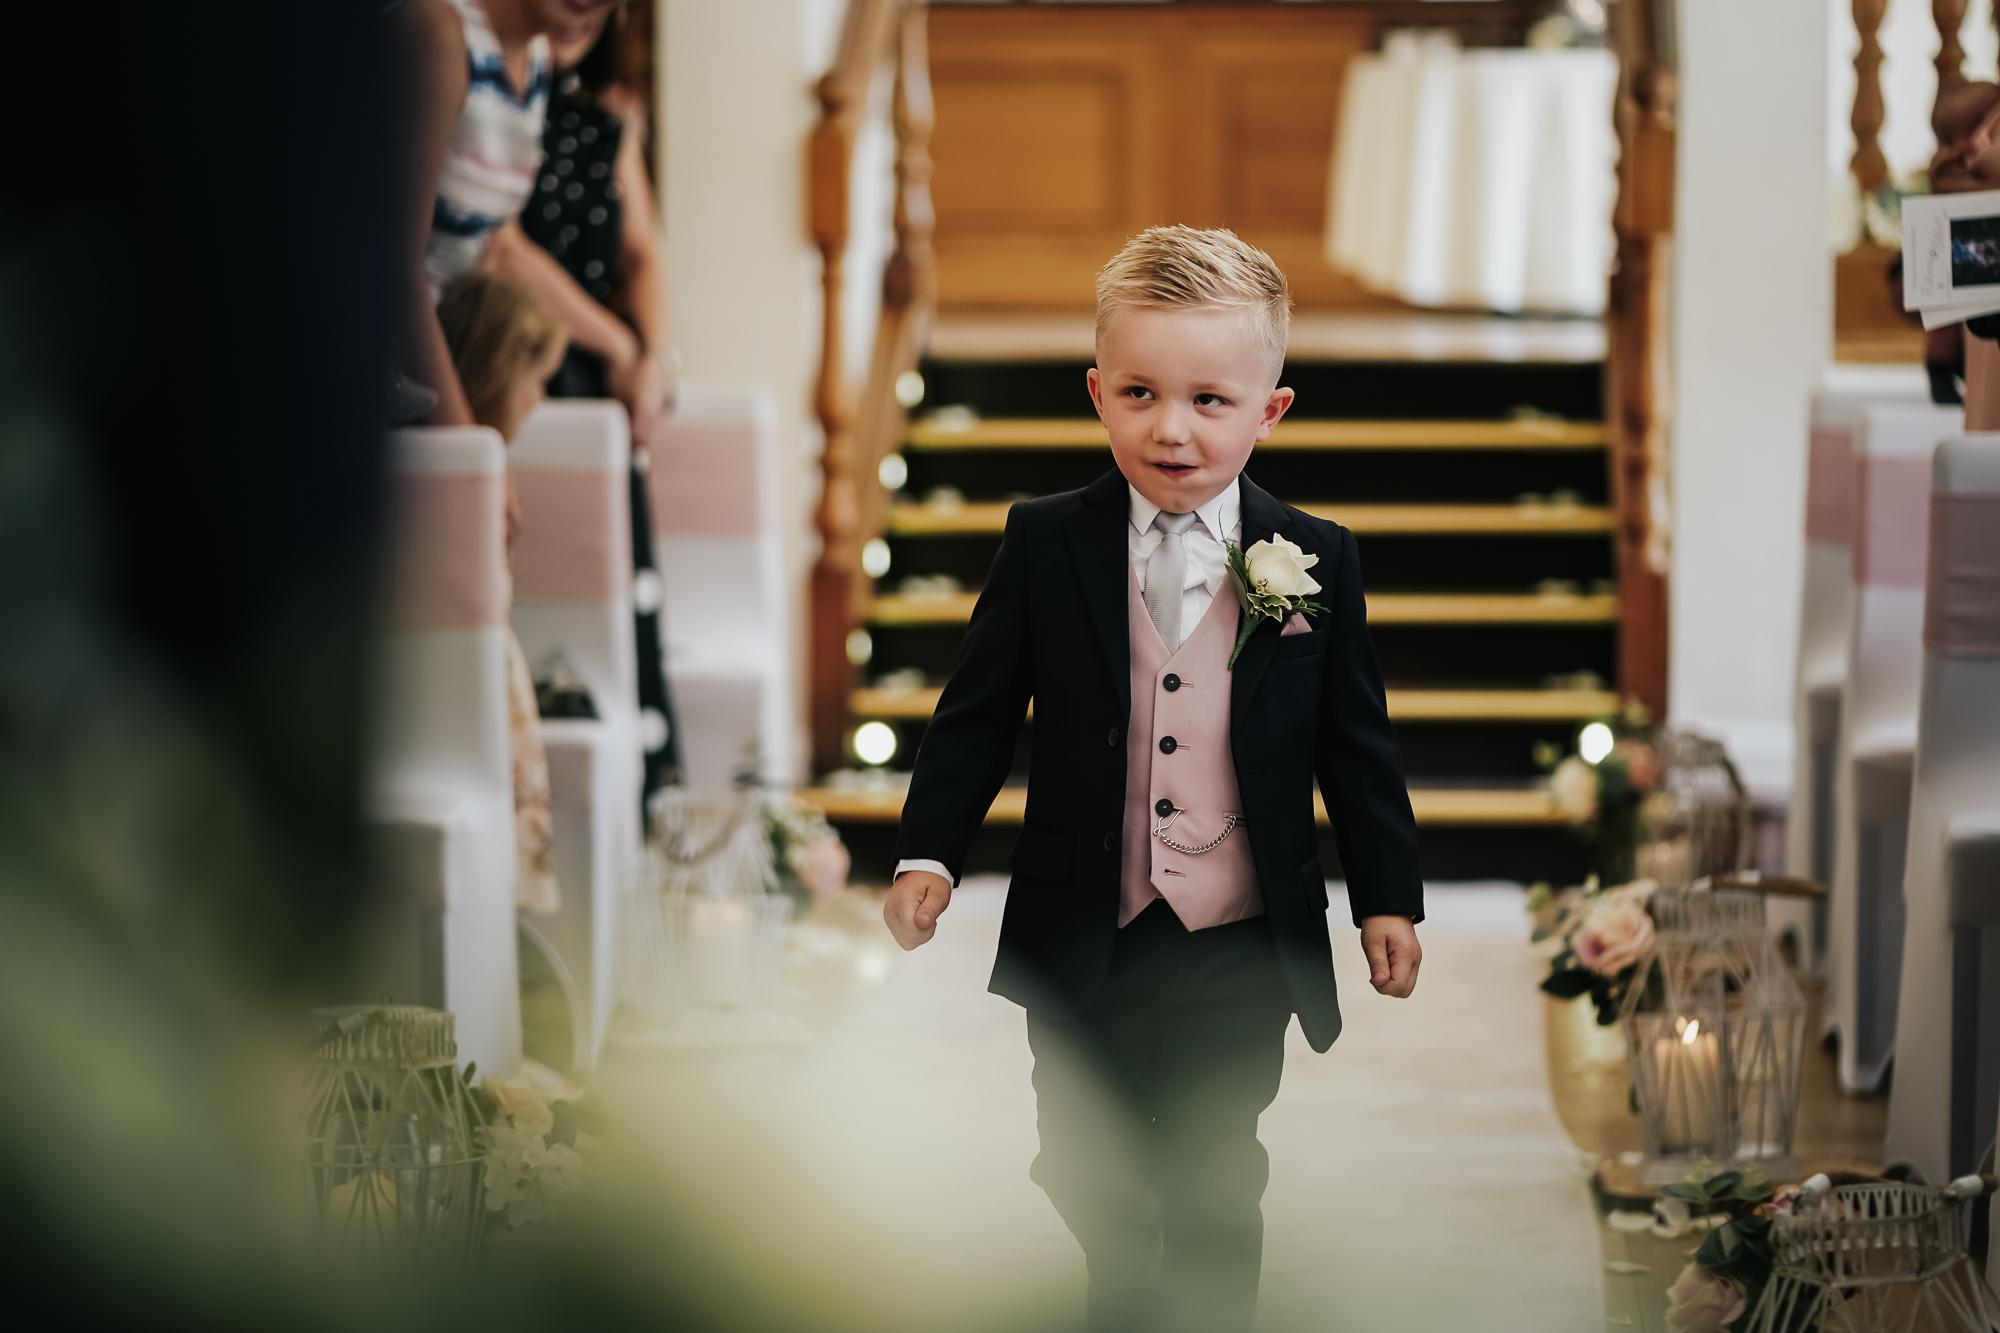 West Tower Wedding Photographer Ormskirk Lancashire wedding photography (21 of 57).jpg